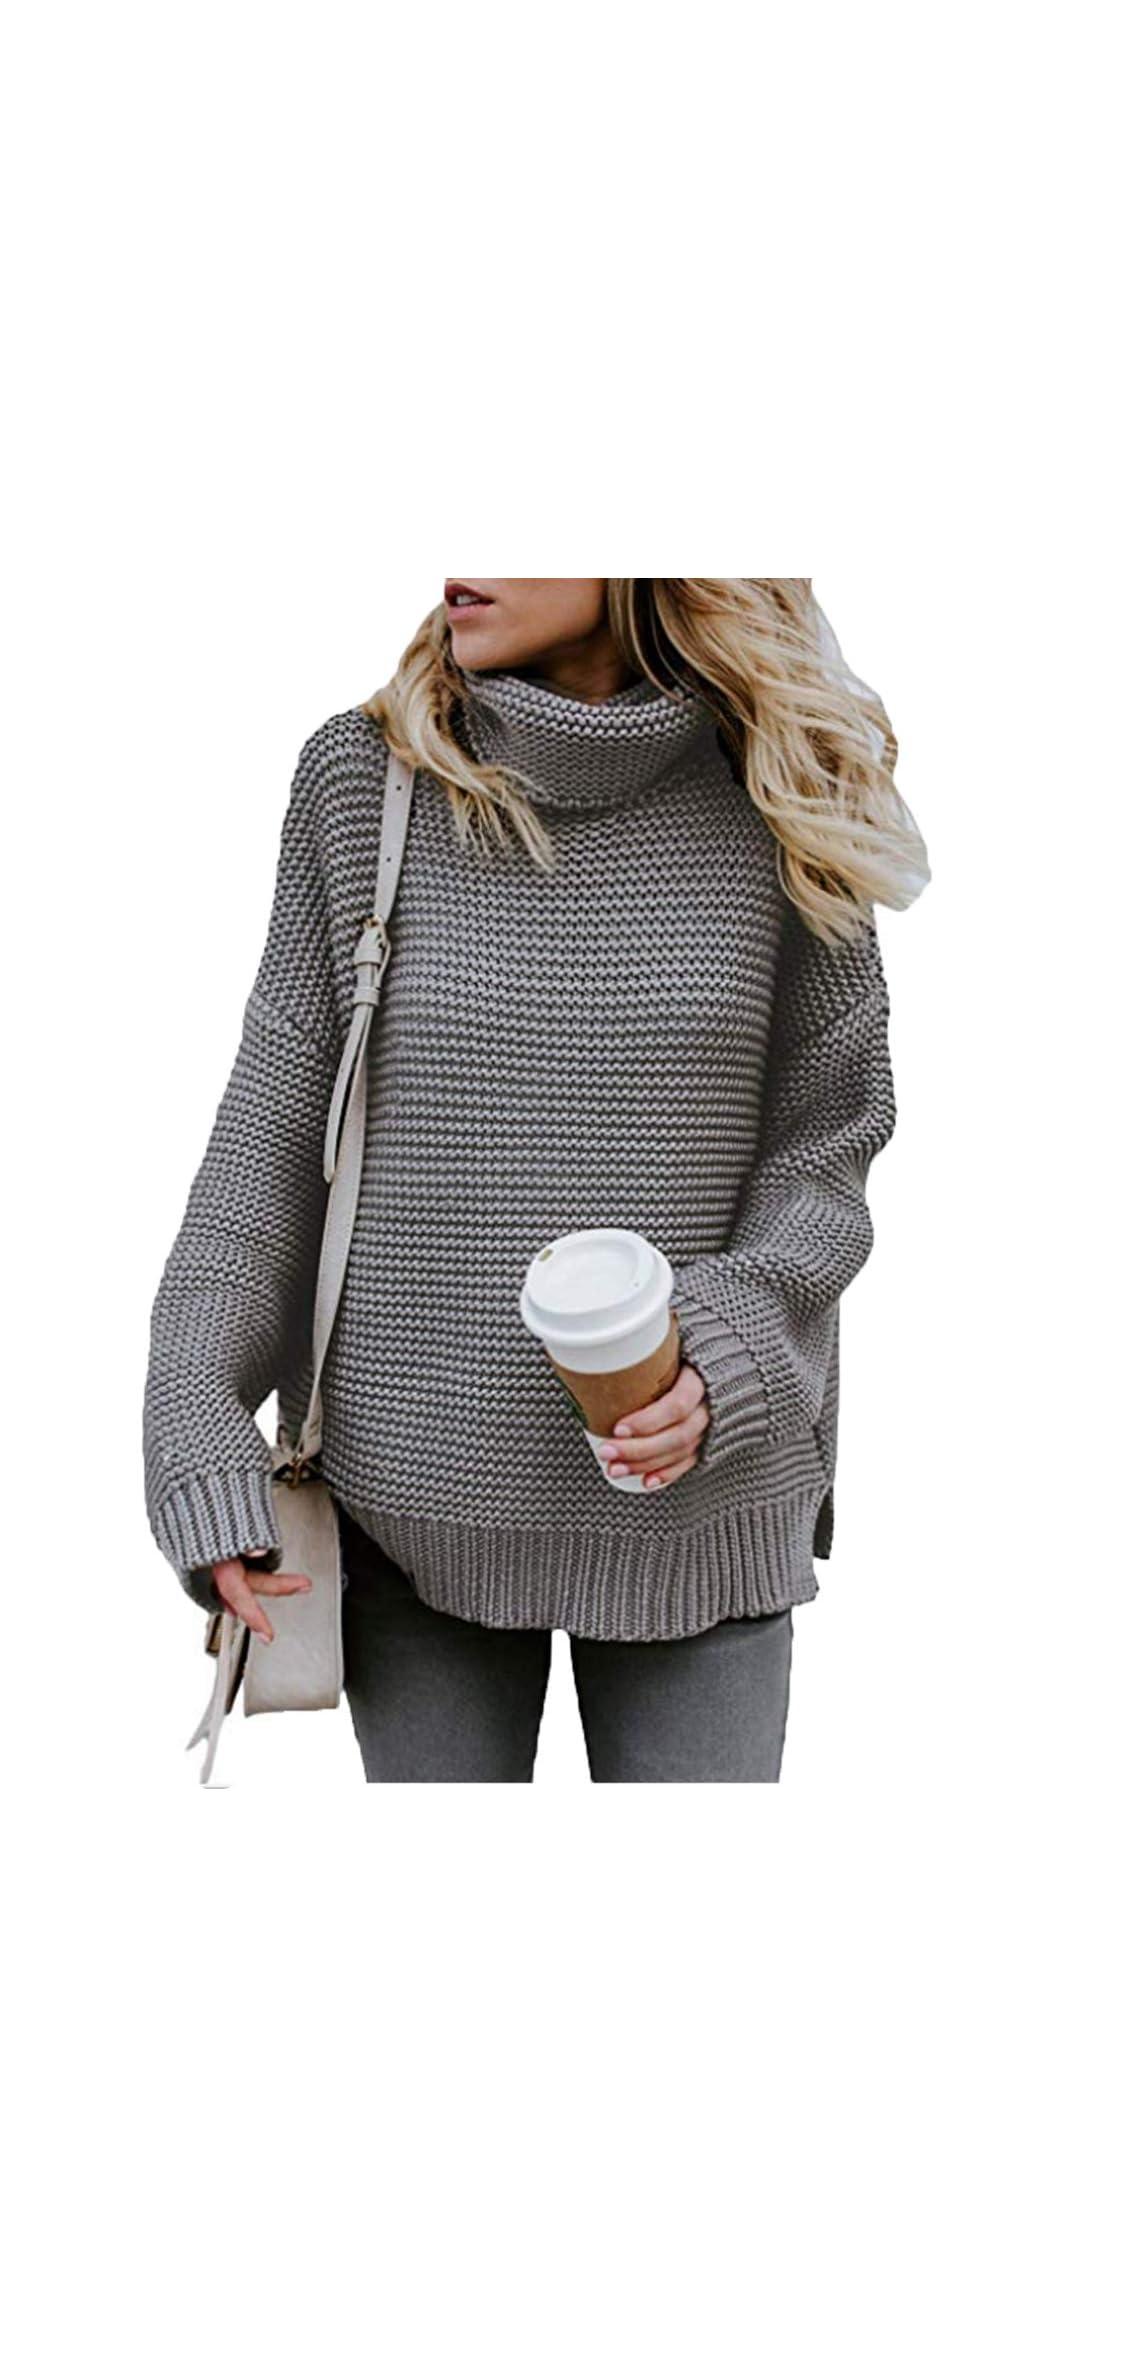 S-xl Women Turtleneck Long Sleeve Chunky Knit Casual